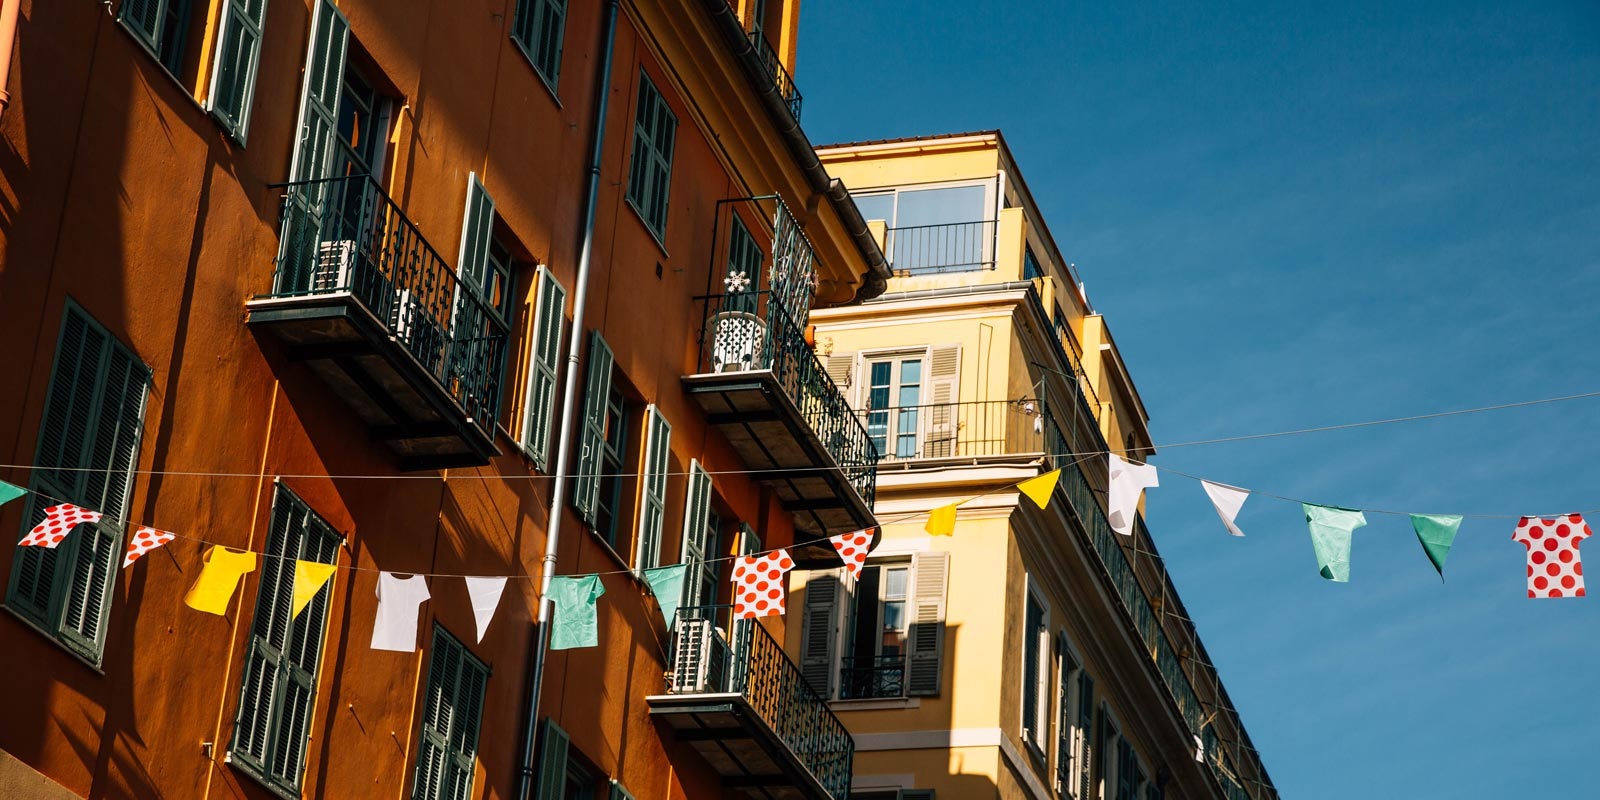 Take me back to Turini: The Tour de France returns to Nice